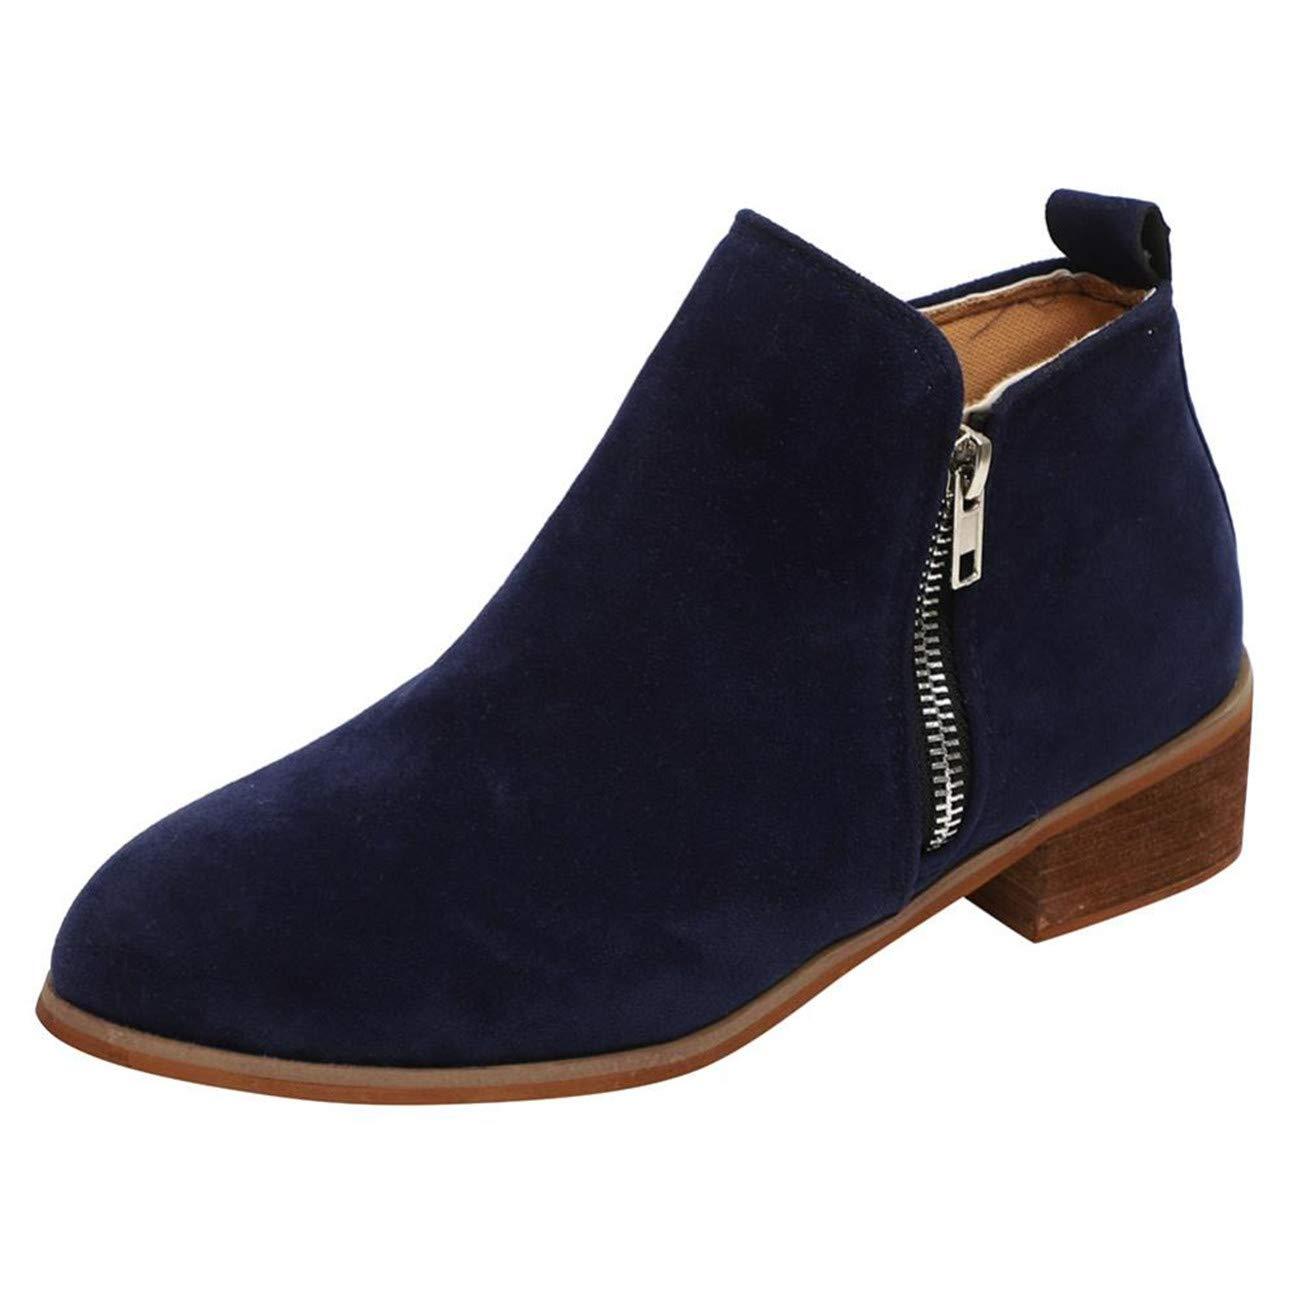 Chaussures Femme Femmes Bottine Courte Bottillons Cuir Knight Mesdames Martin Bottes Chaussures HCFKJ-Js